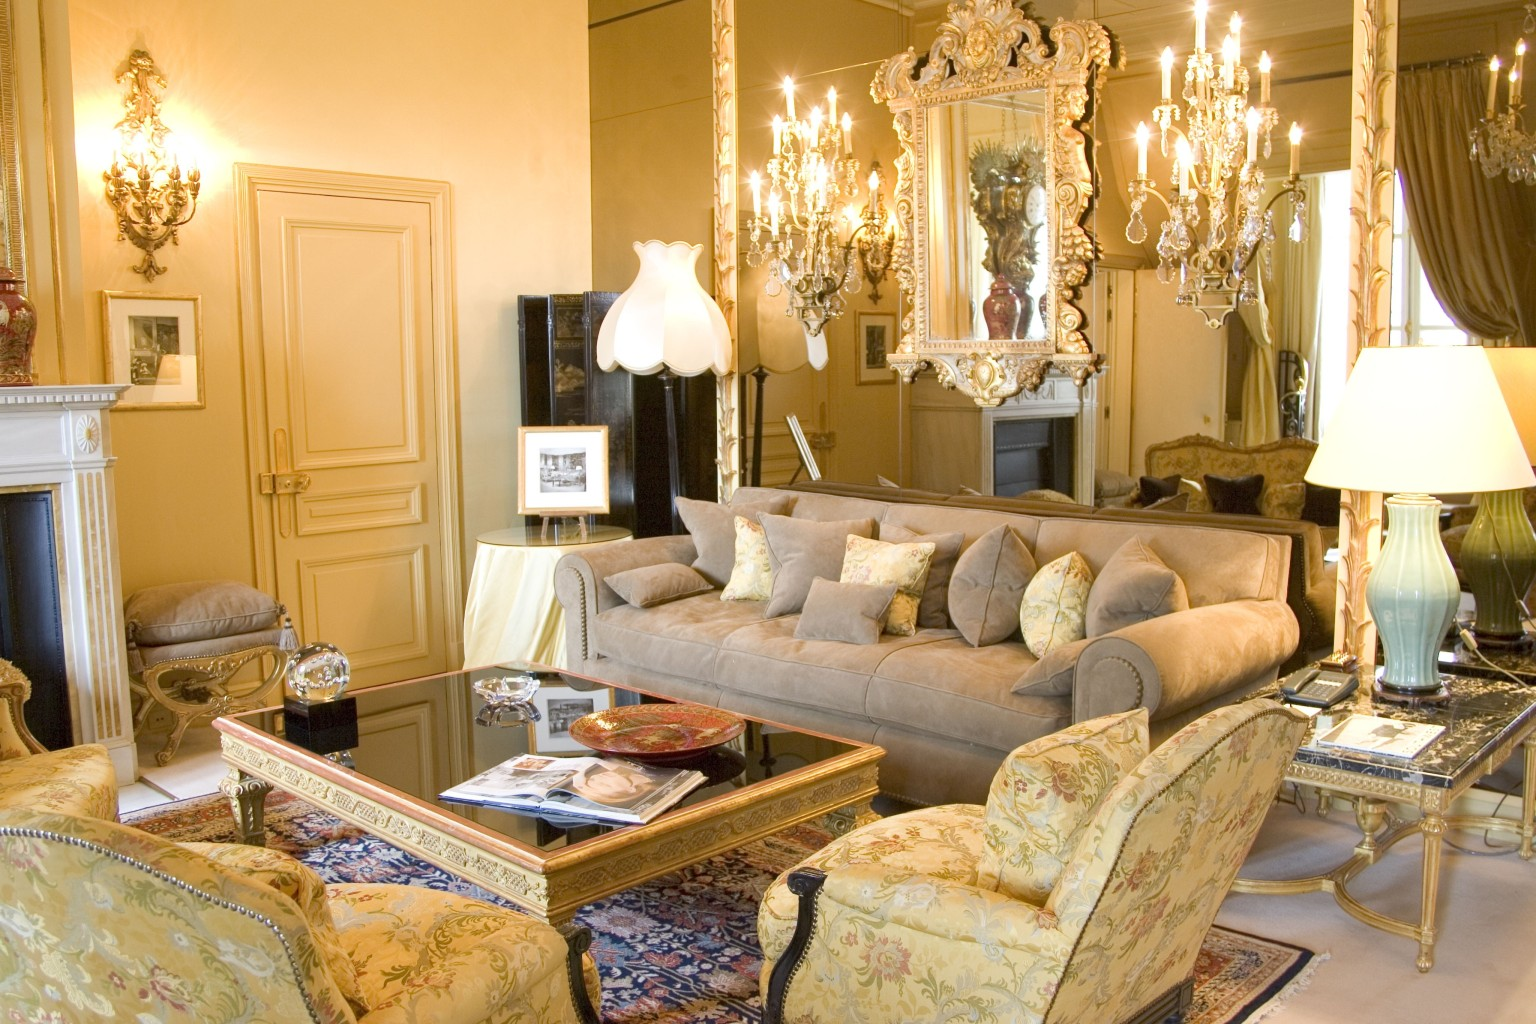 Hotel Rue Pierre Chaubon Paris